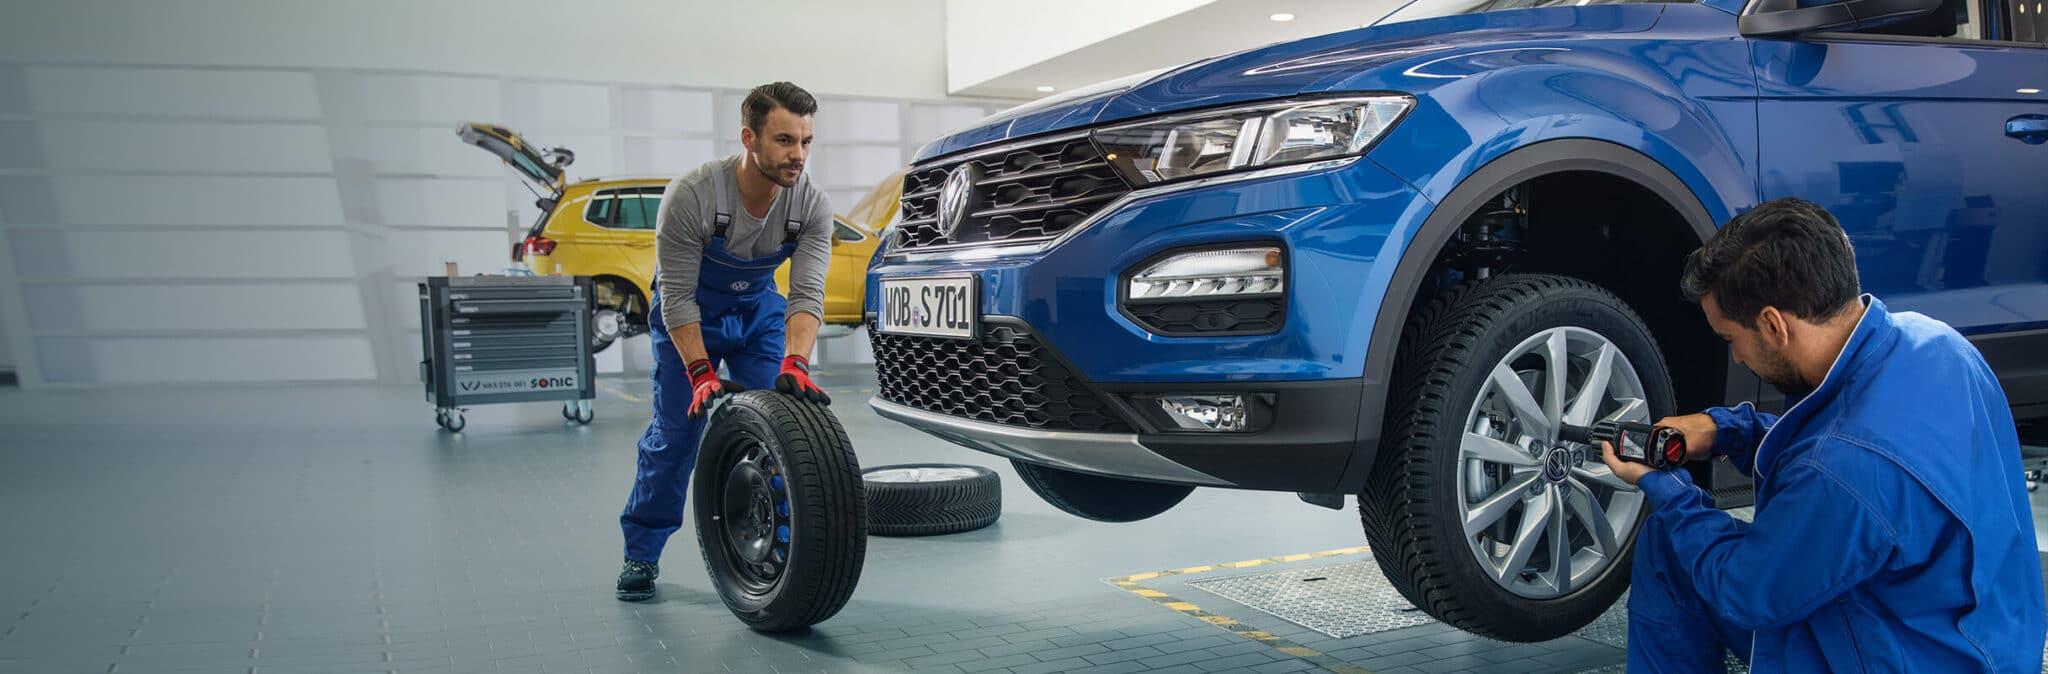 Promo Pneumatici Volkswagen